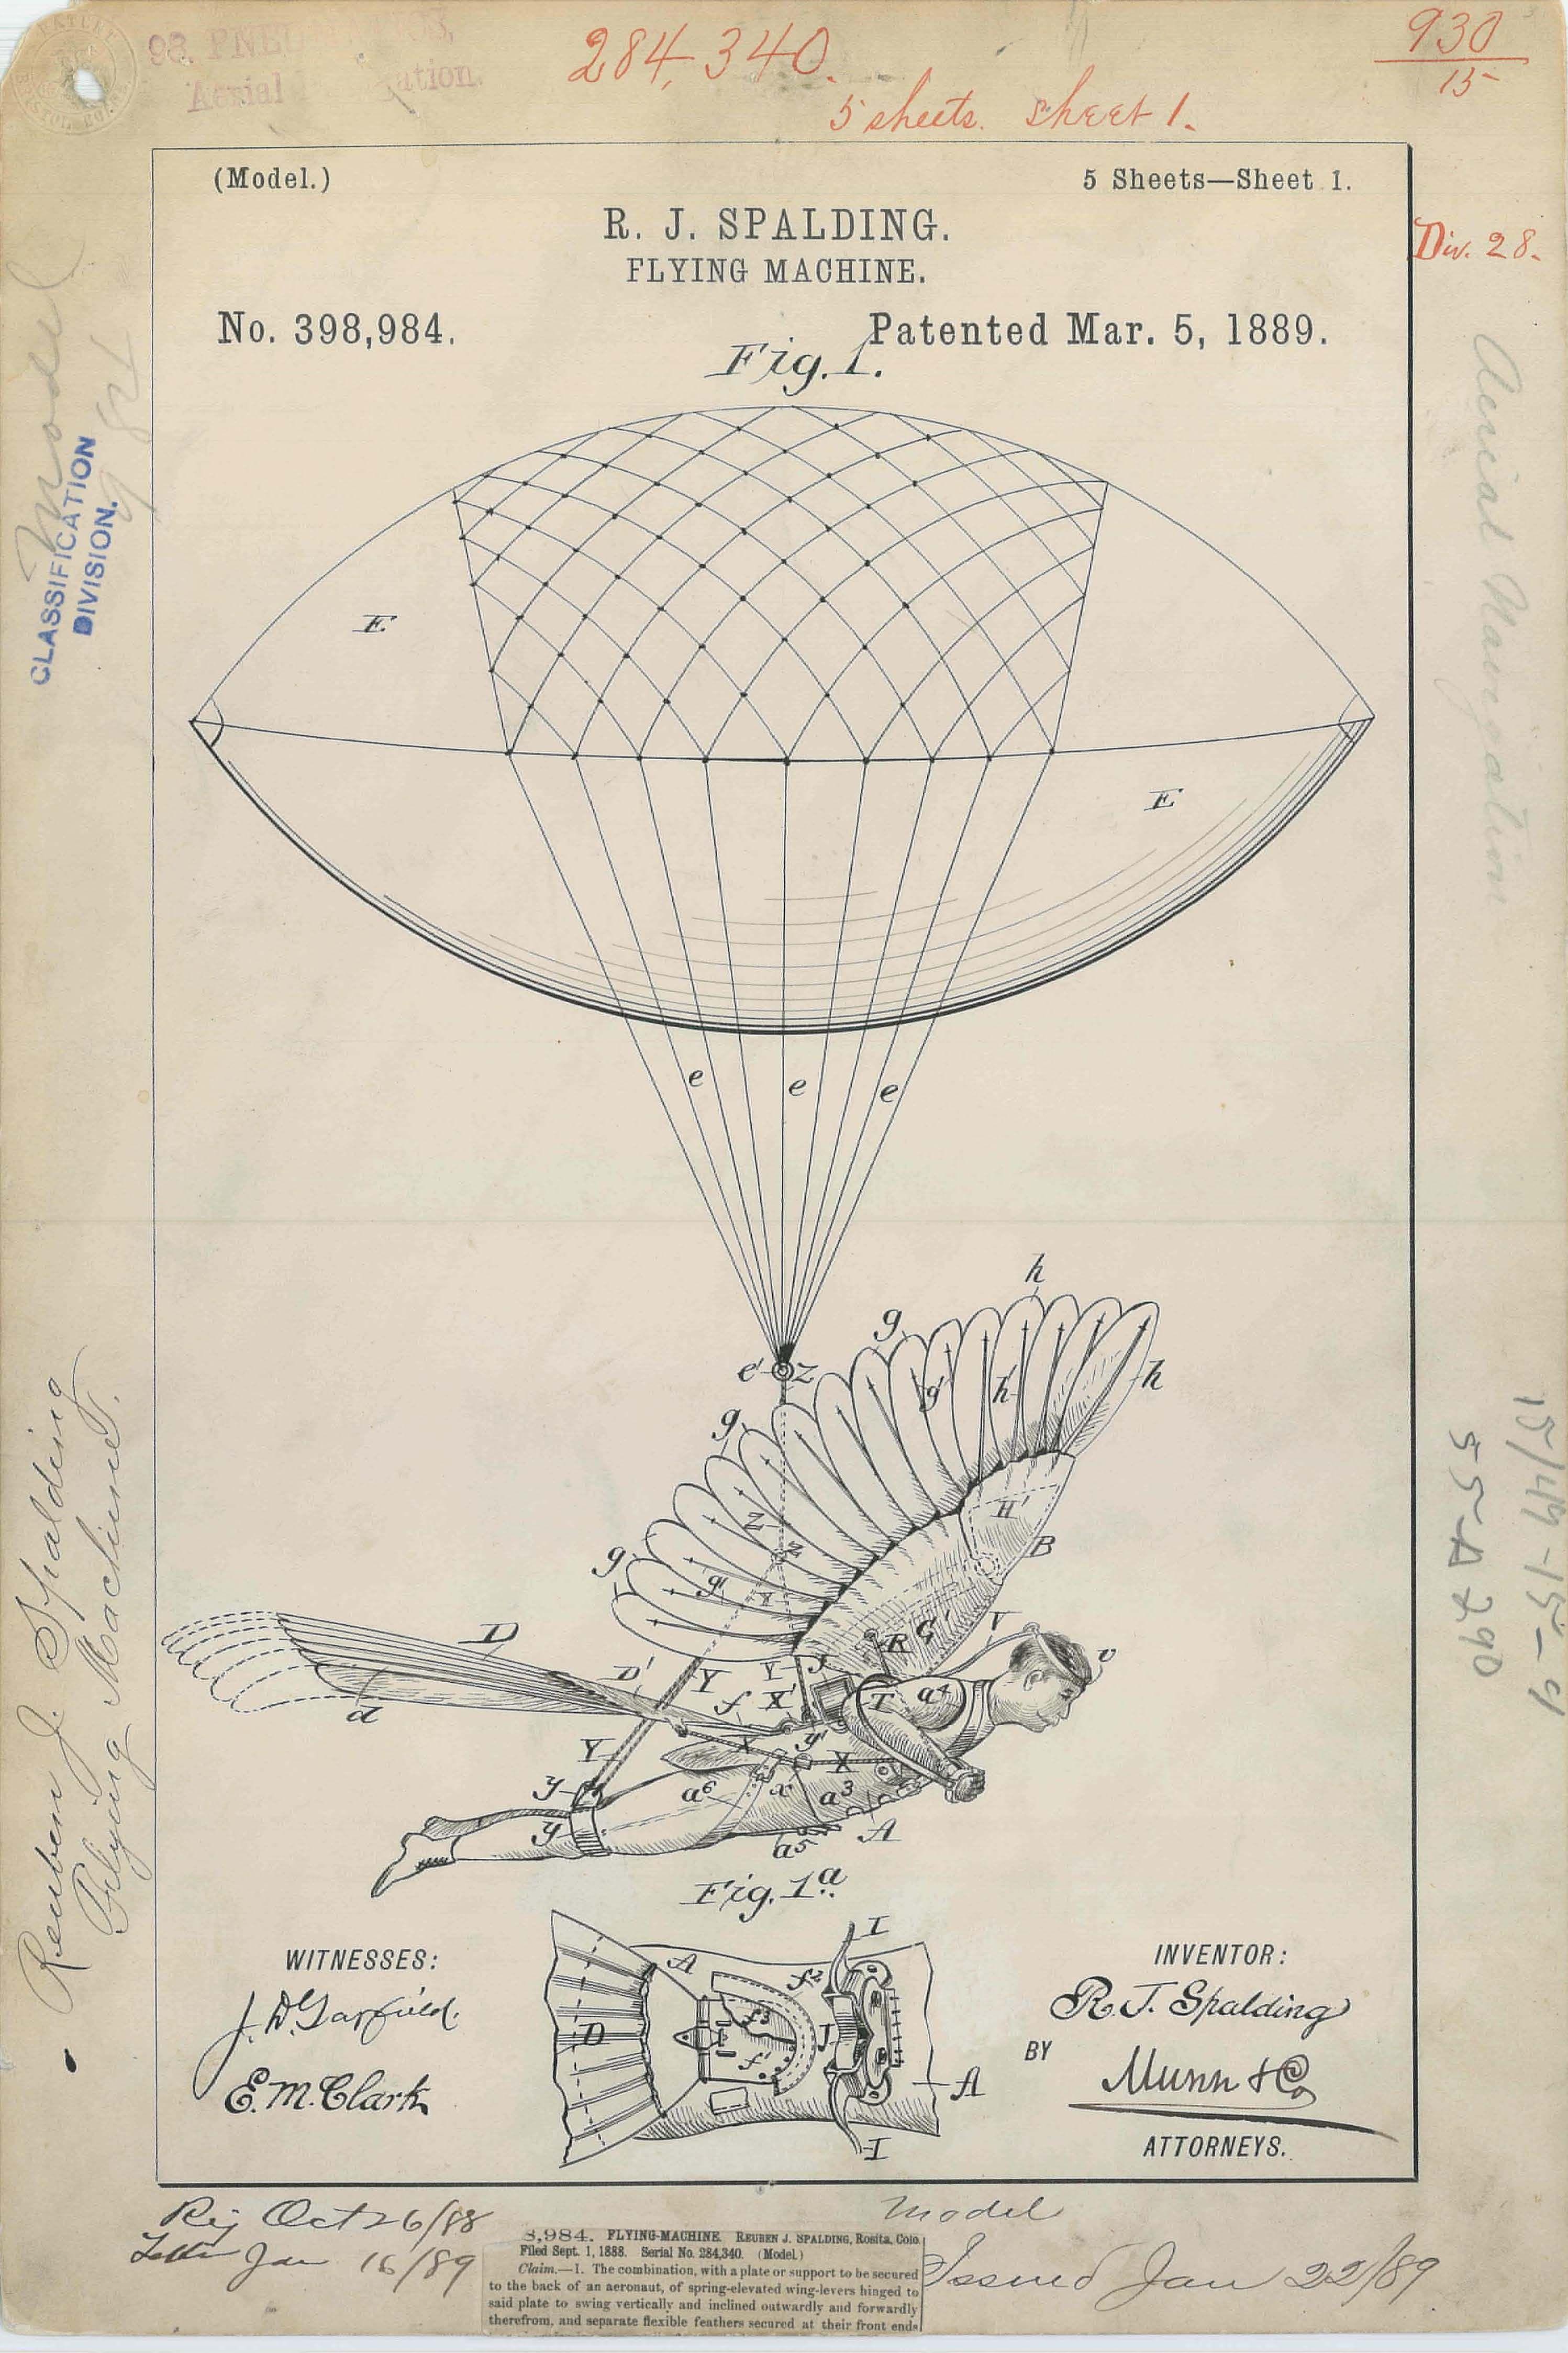 20 cretsiz vintage yazdrlabilir blueprints ve diyagramlar 20 cretsiz vintage yazdrlabilir blueprints ve diyagramlar remodelaholic printables blueprint art malvernweather Images